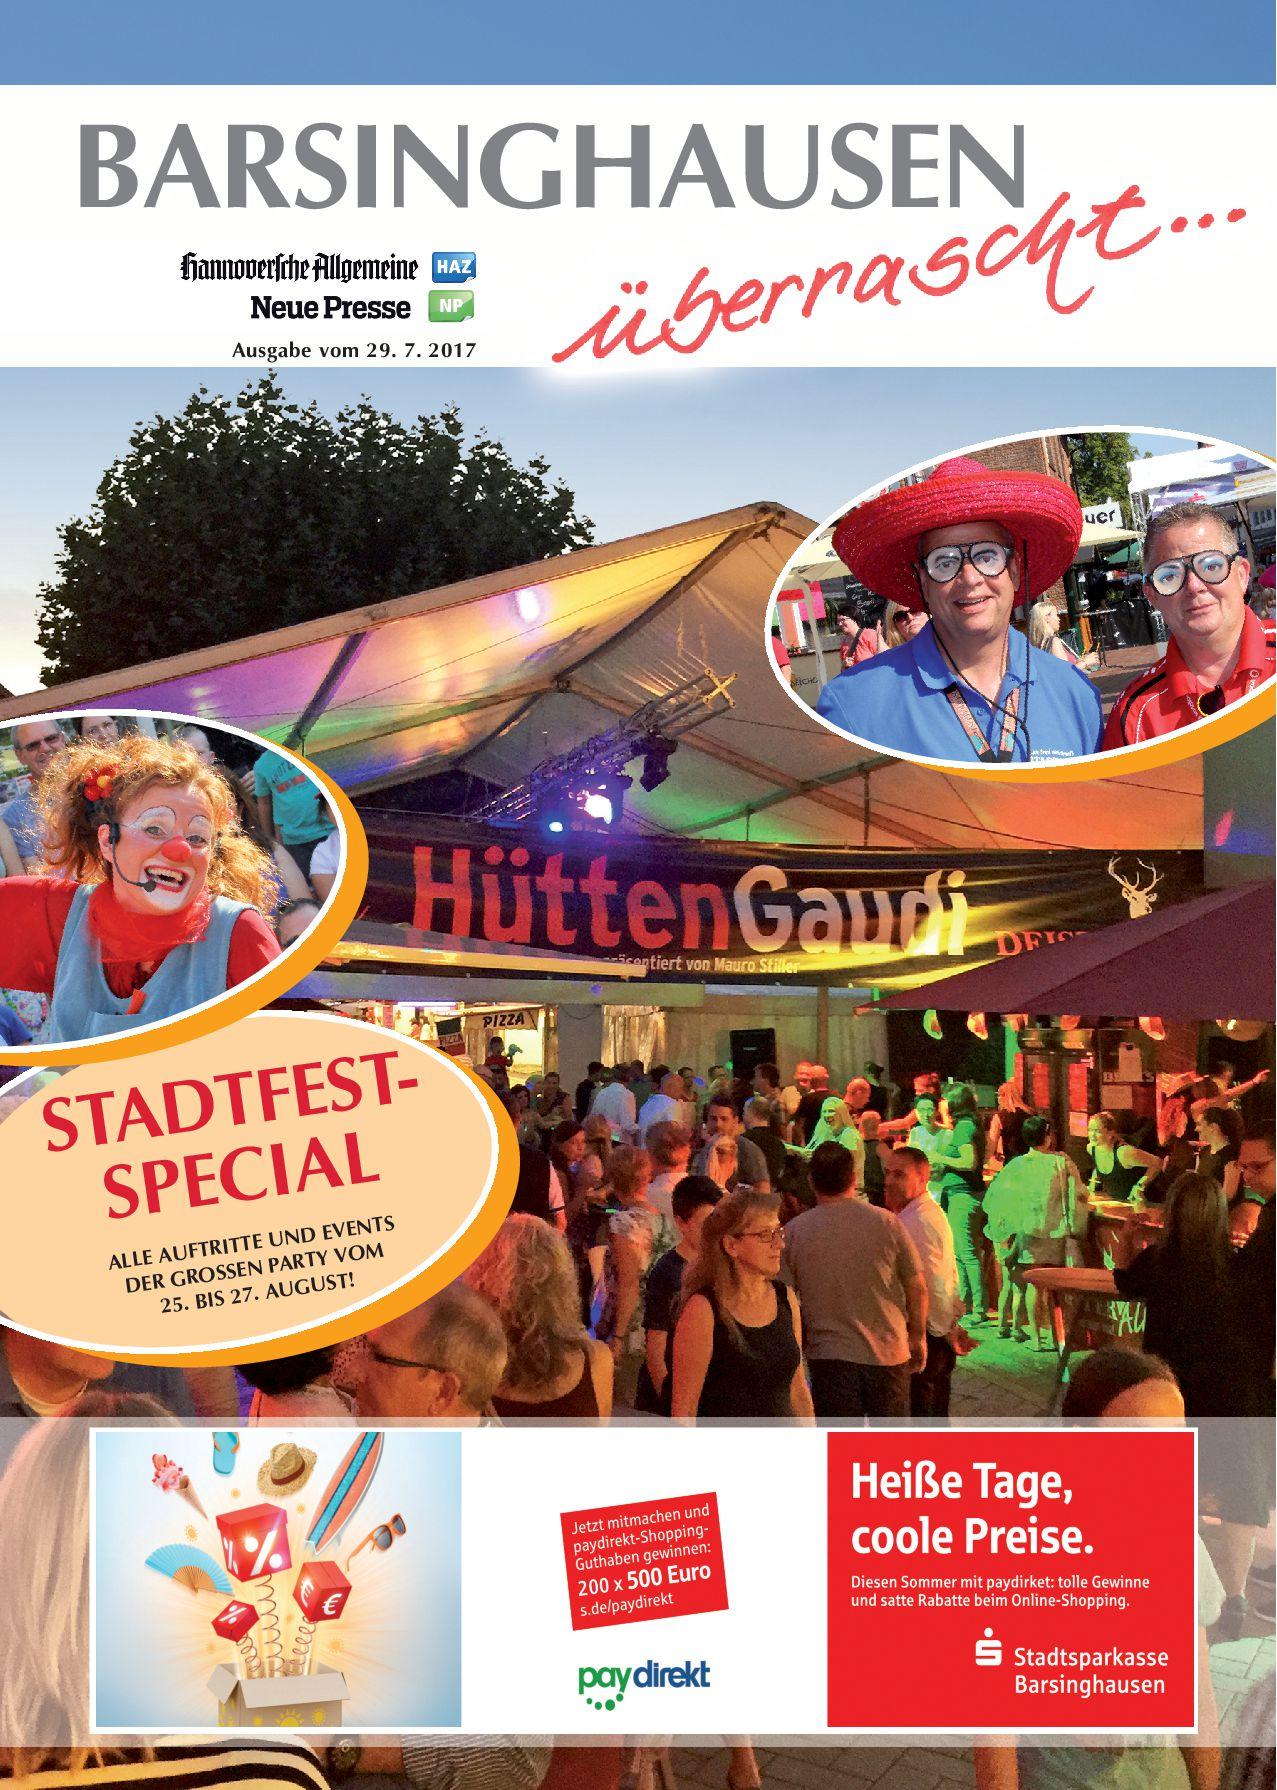 barsinghausen-nr-6-vom-29-07-2017